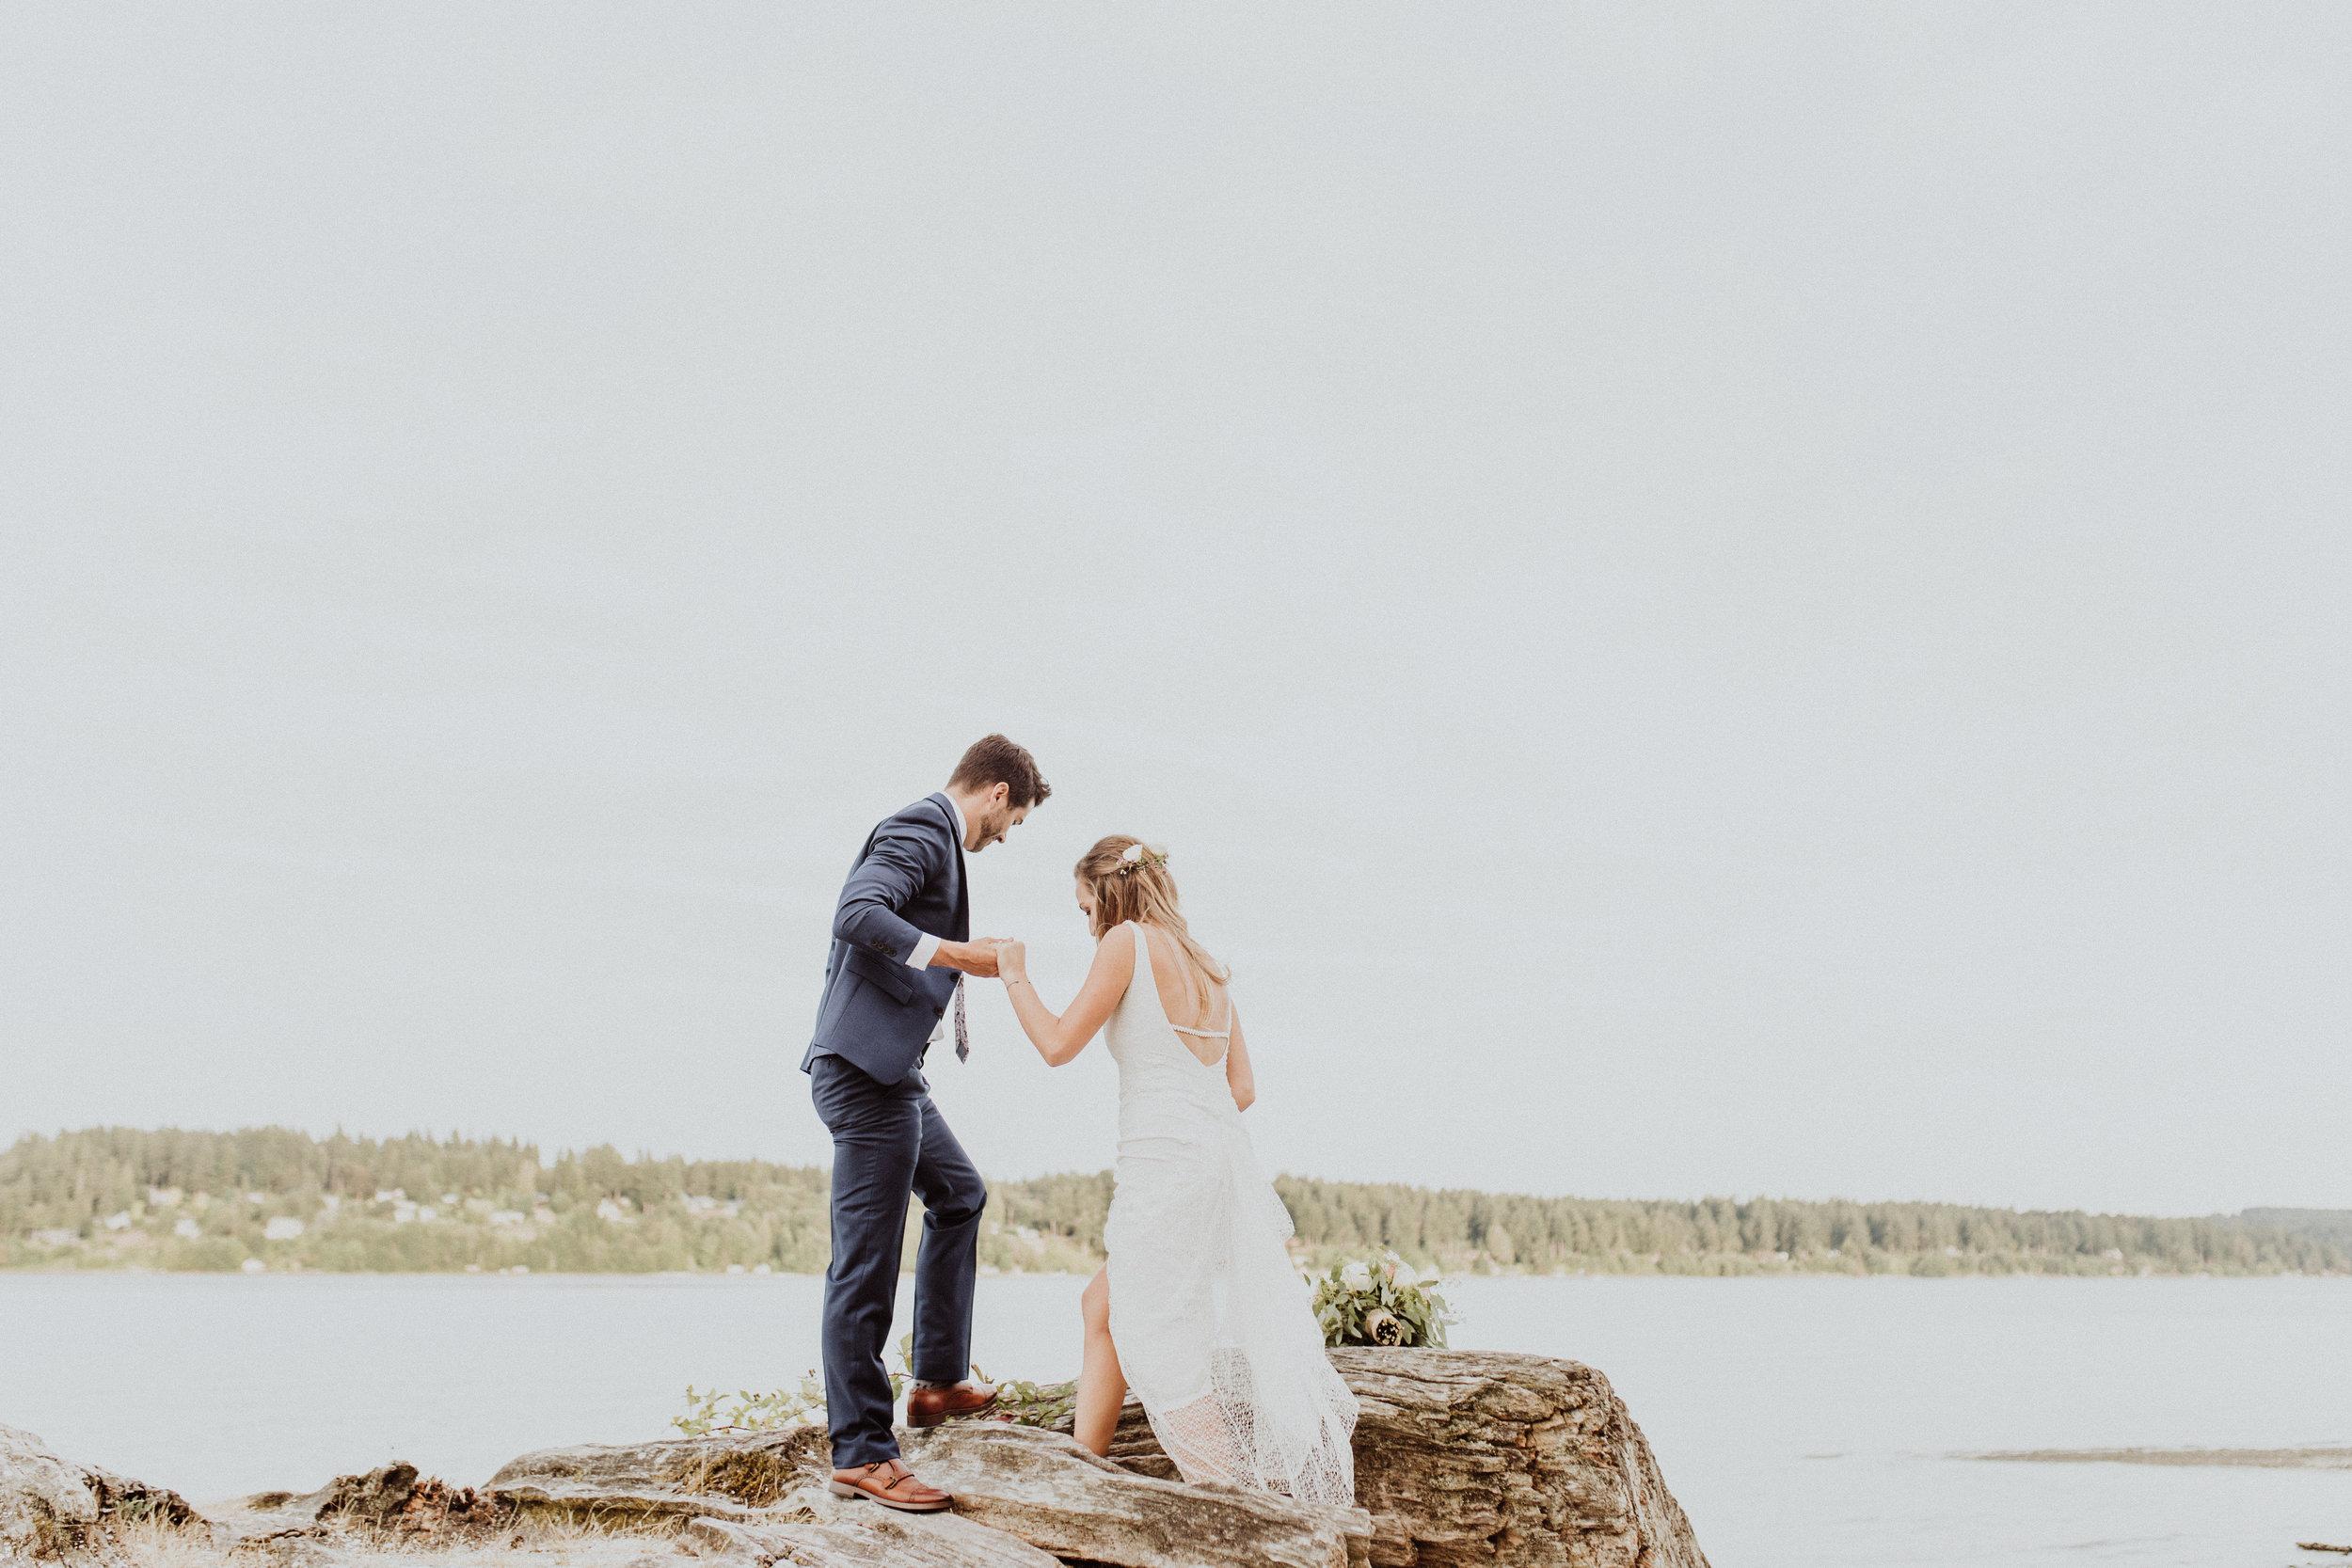 kiana lodge wedding photographer seattle